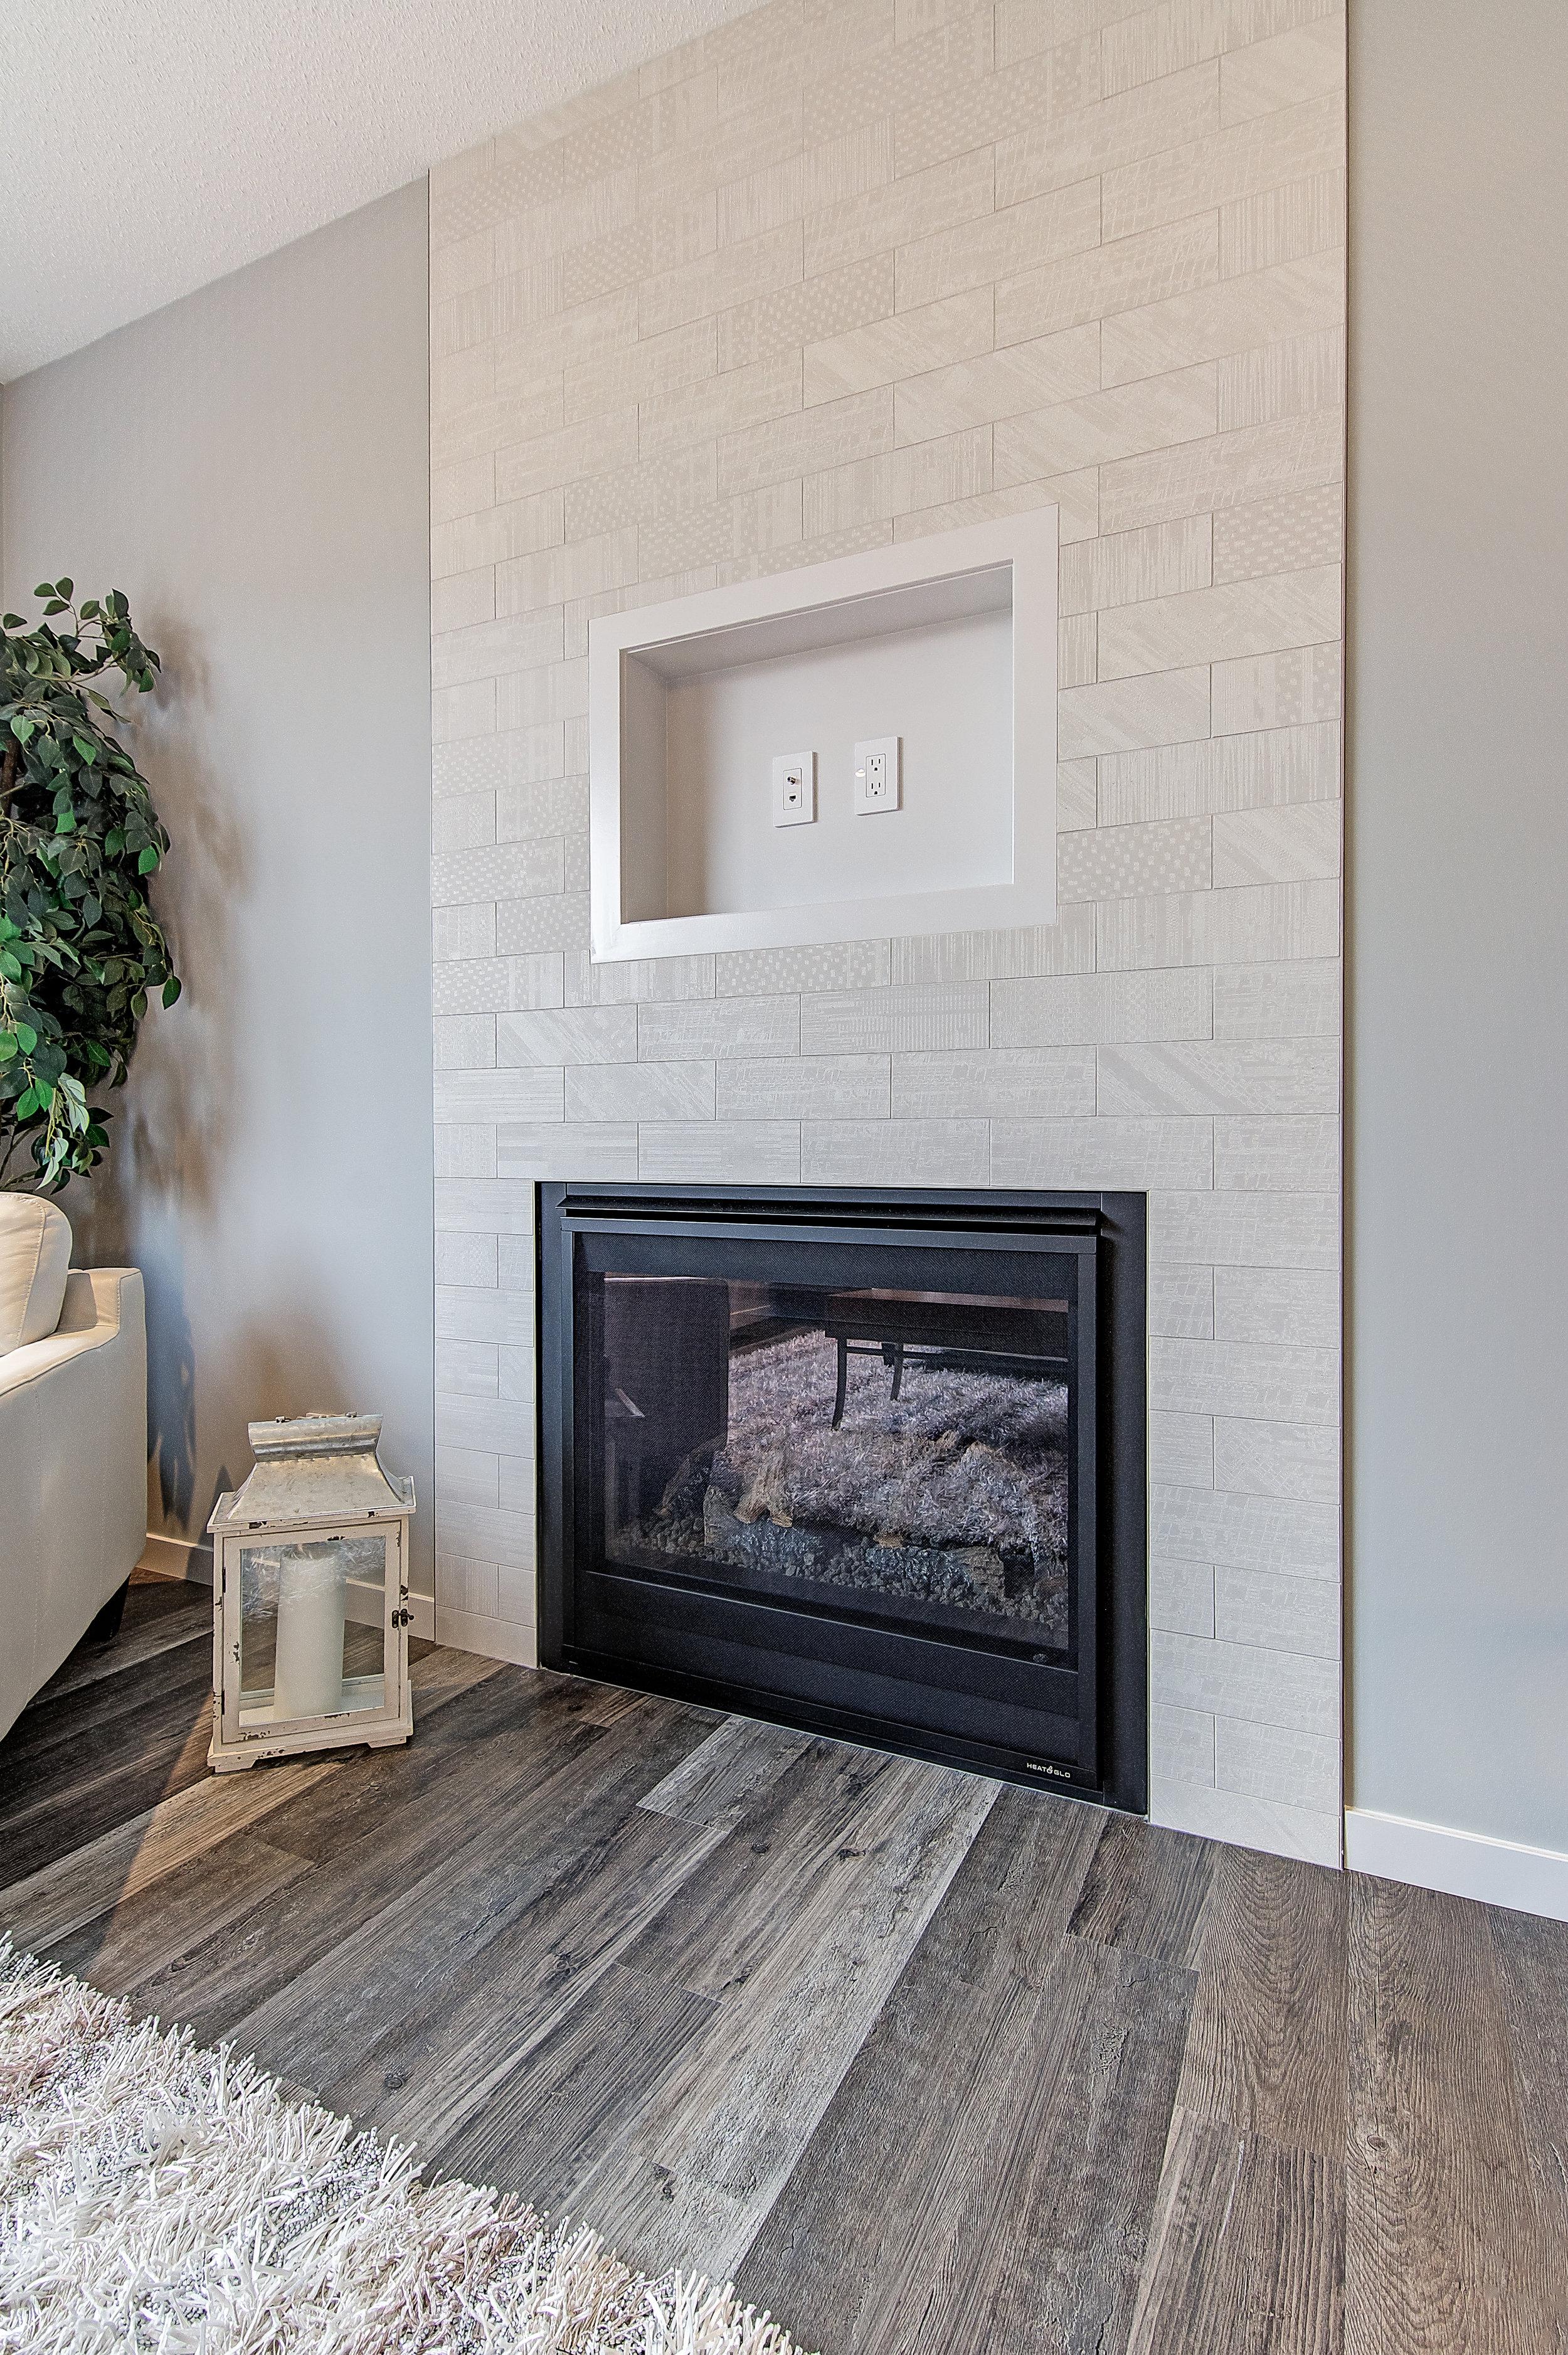 12-main fireplace-.jpg